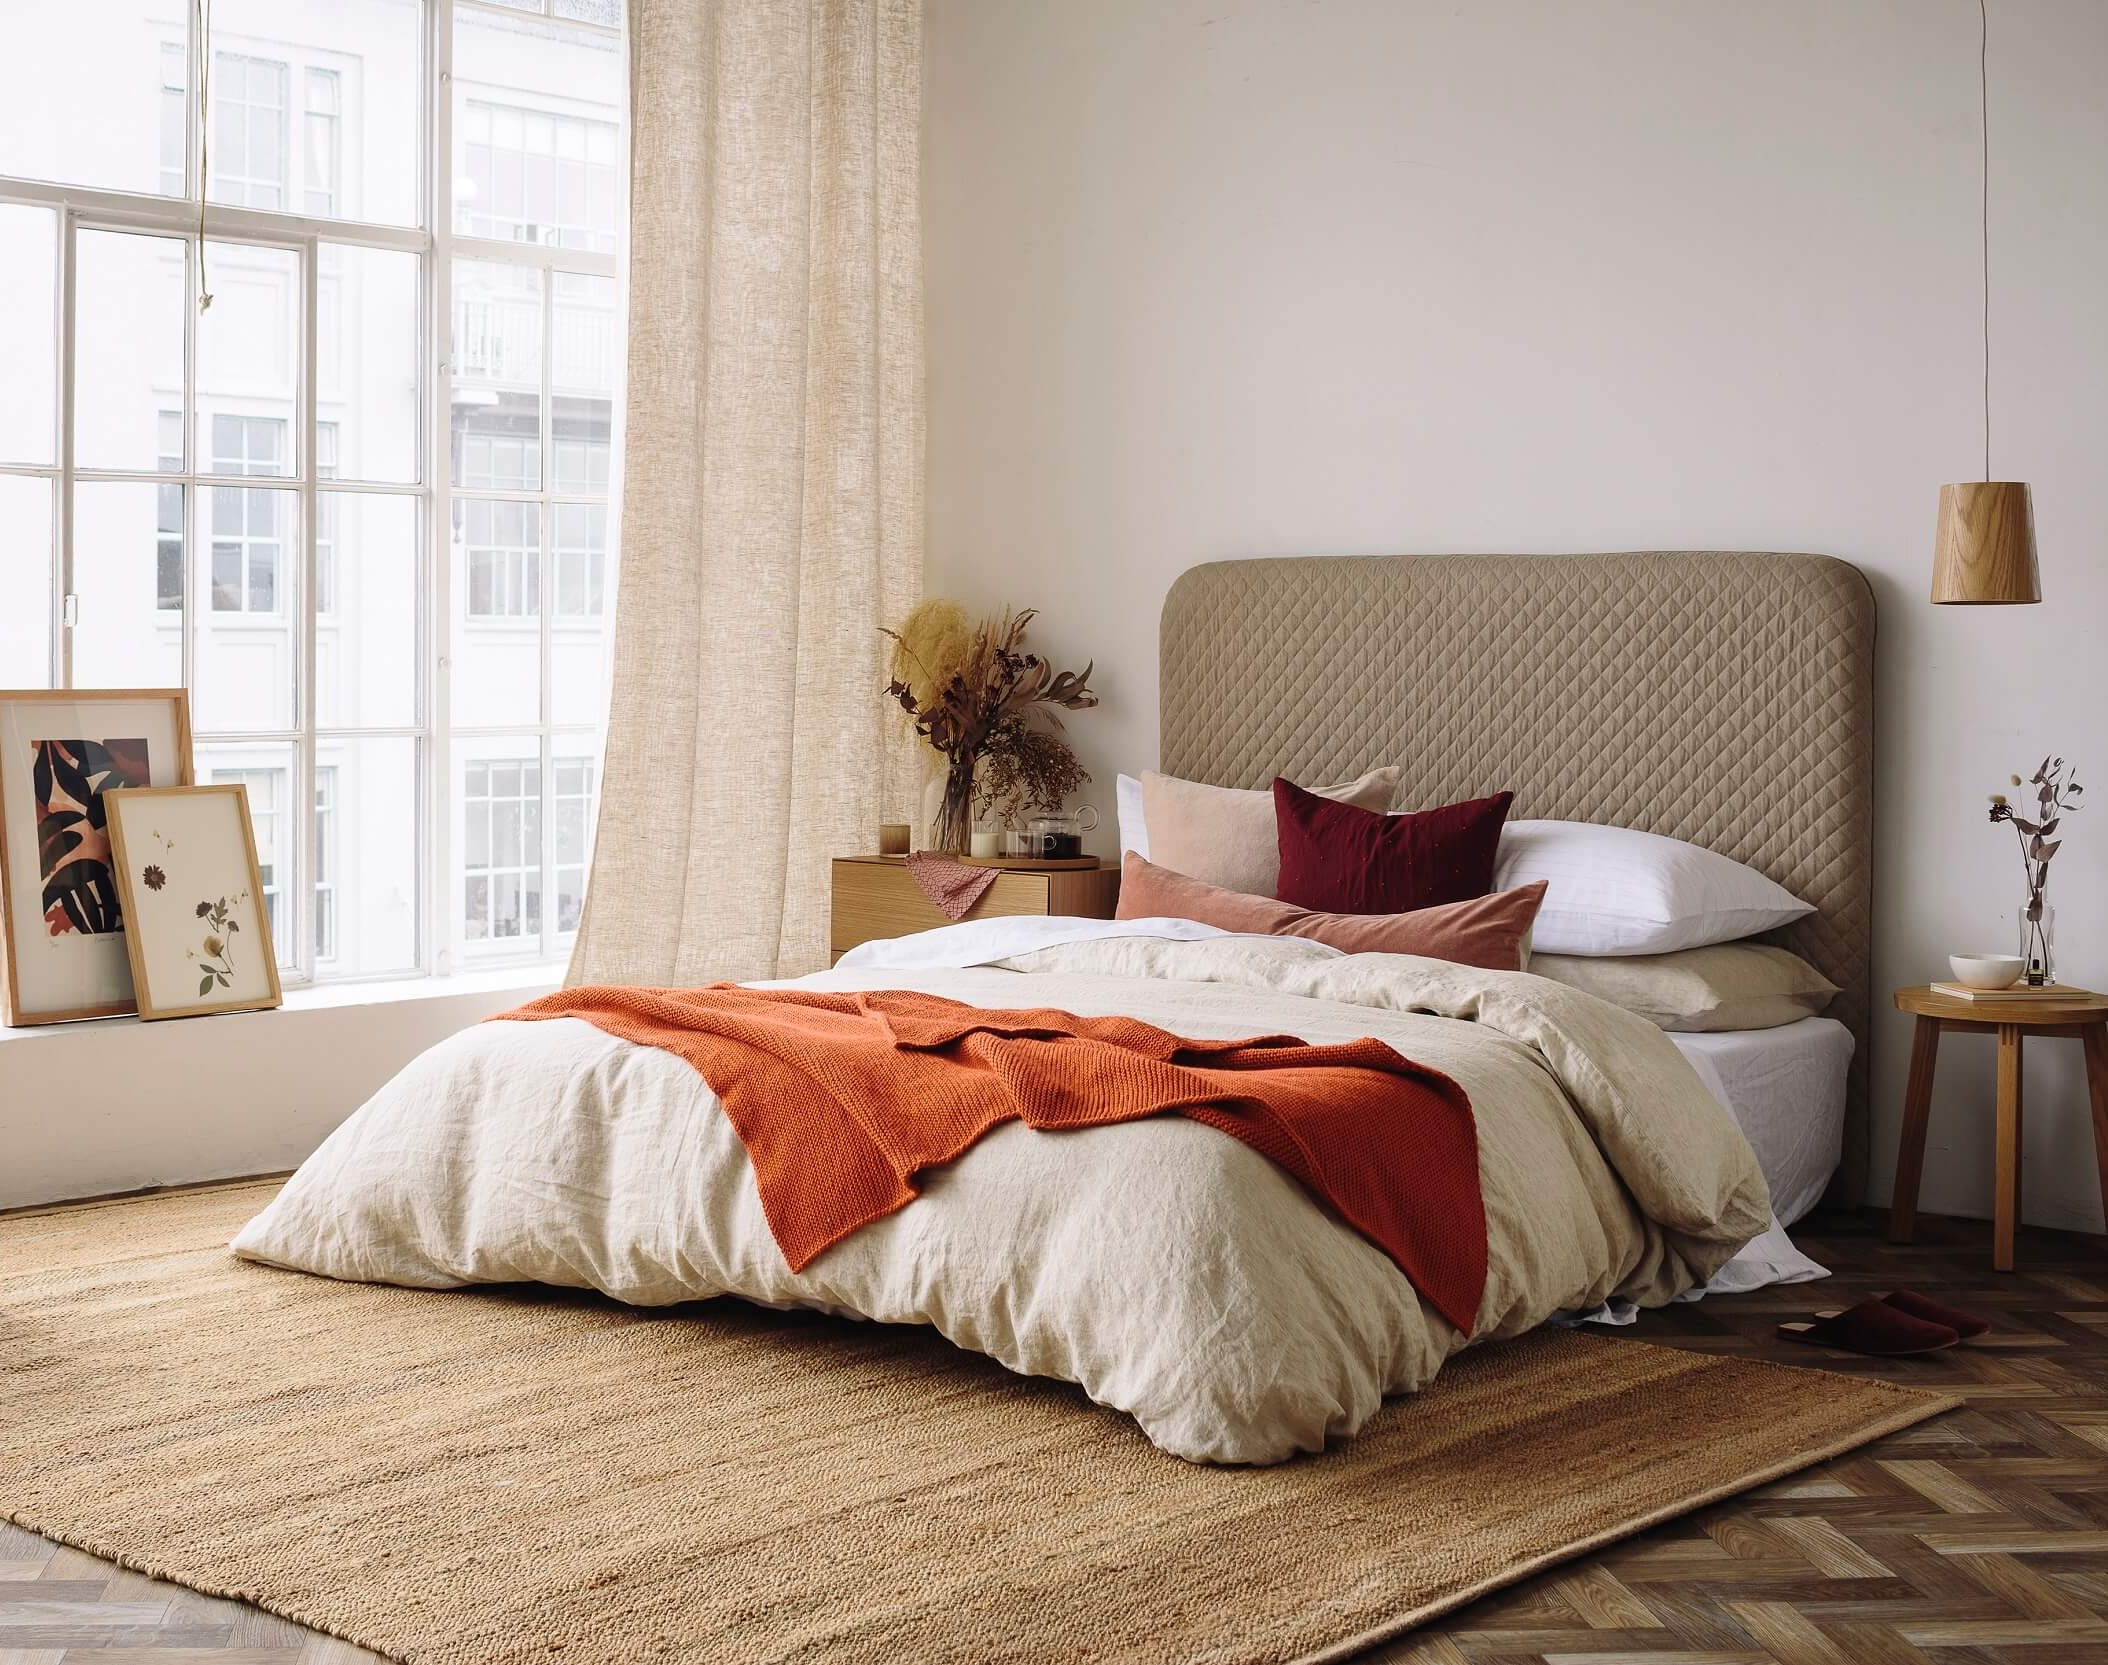 Styleyourspace.Bedroom2-205.jpg